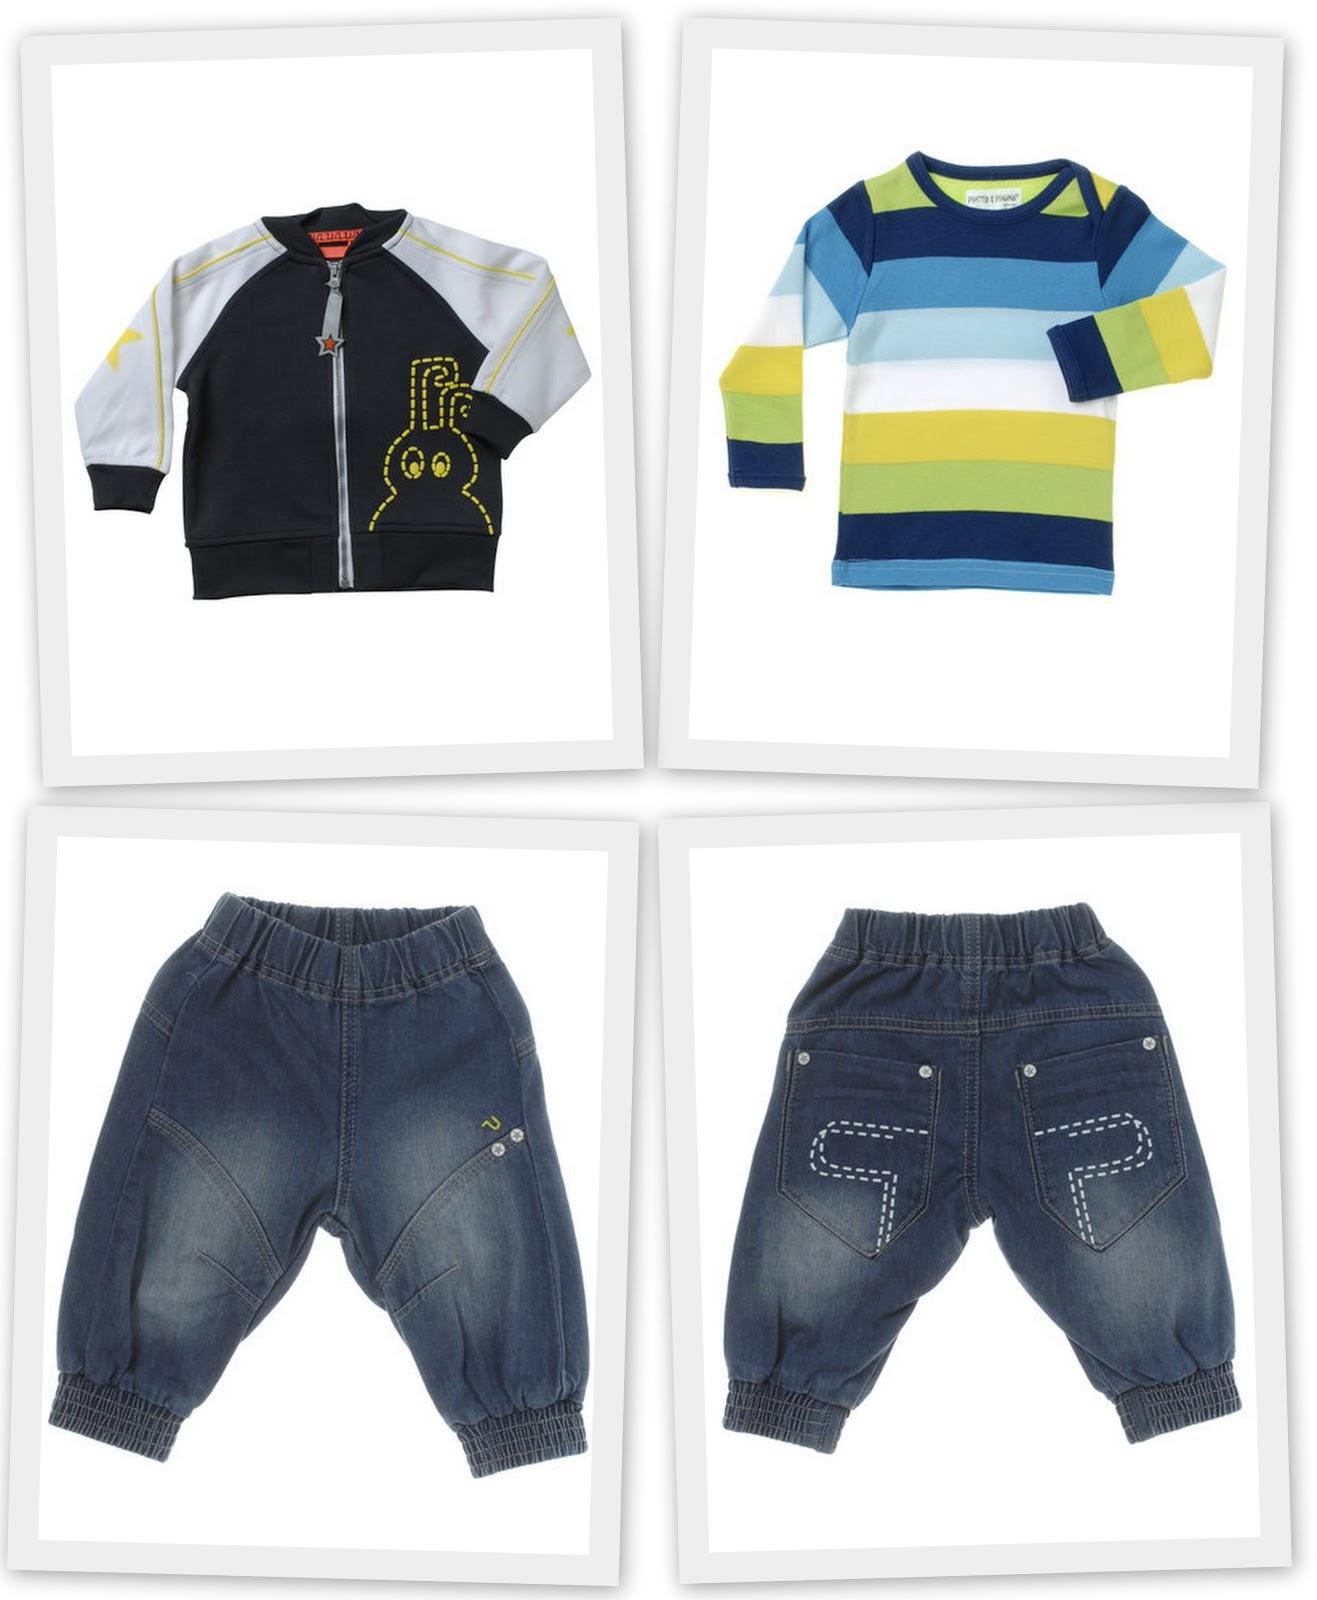 dfe689969de Phister & Philina T-shirt – 149,75 kr. // Phister & Philina jeans – 269,75  kr. //